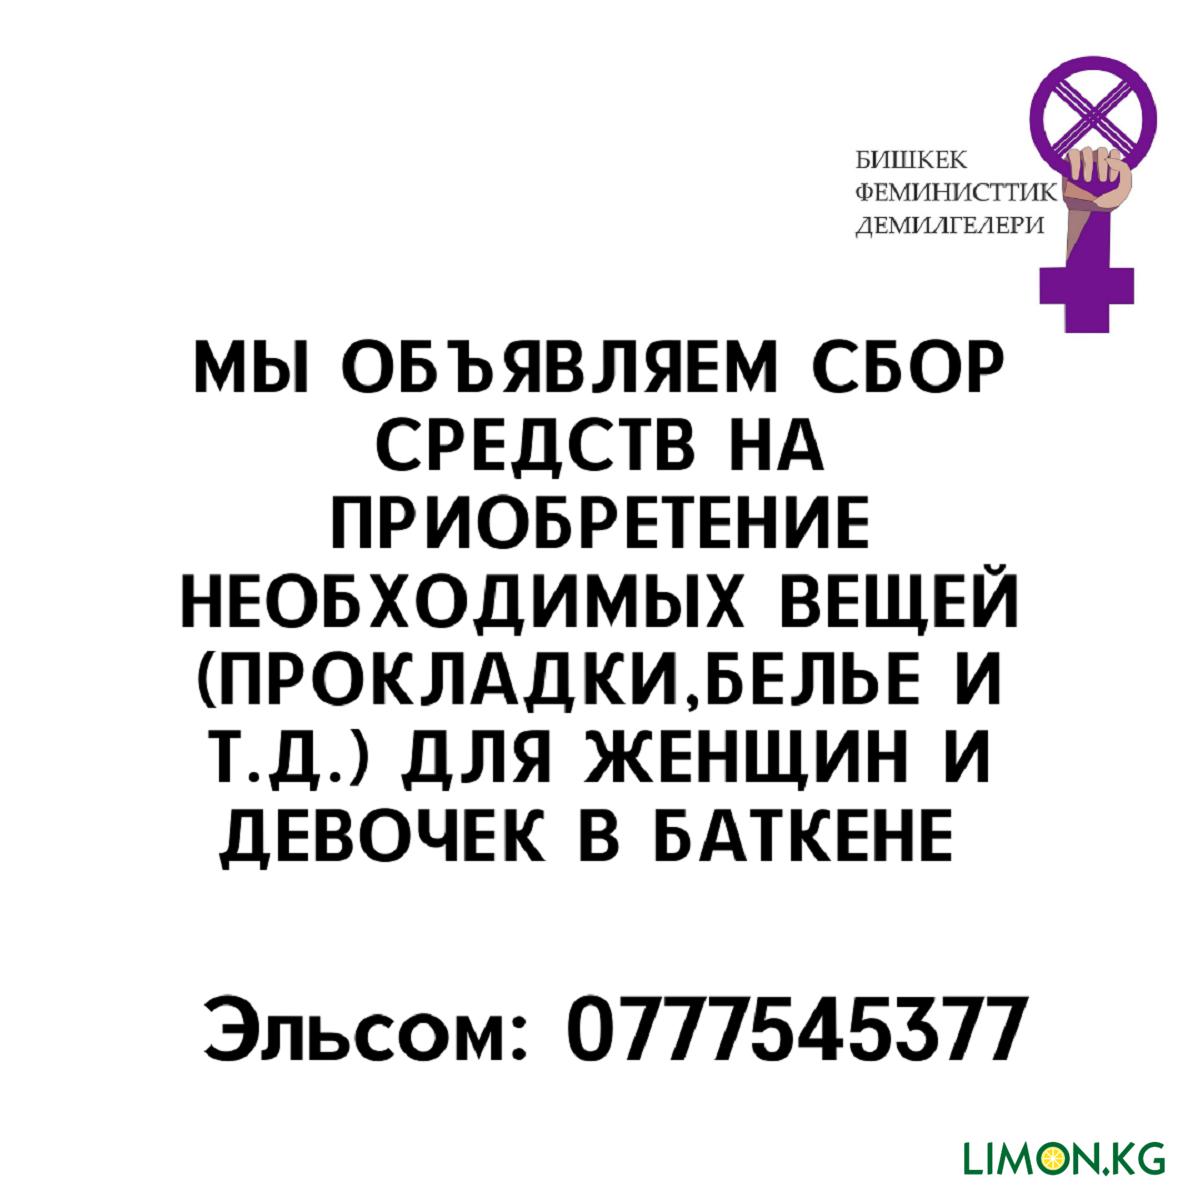 180974641_3978892388853926_4857678232144168035_n